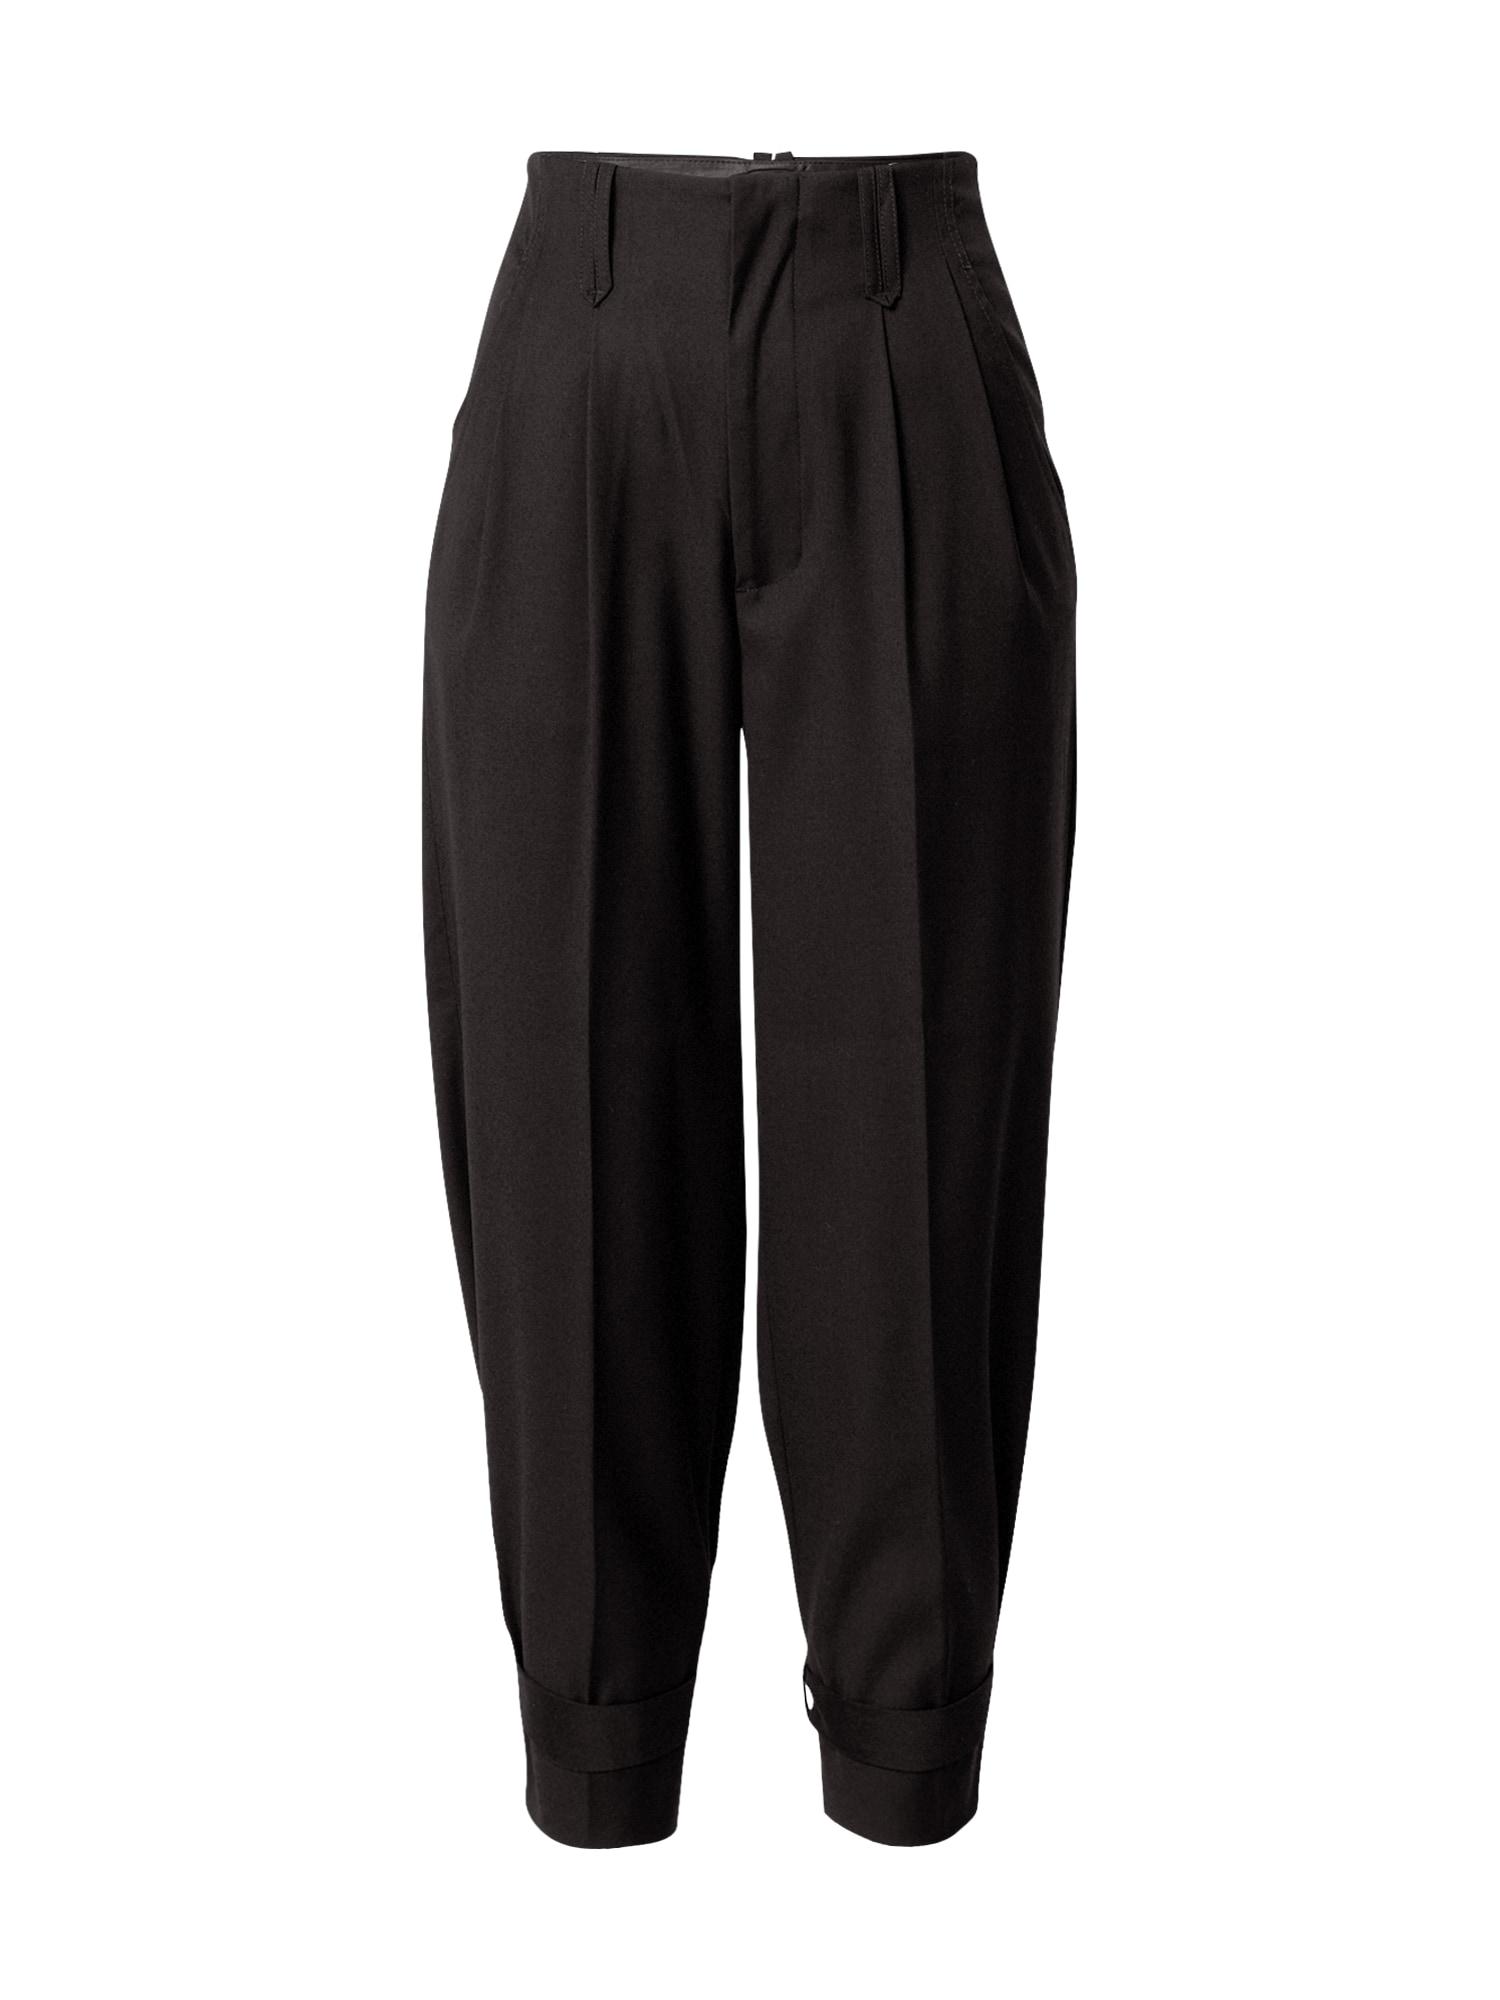 Aligne Kalhoty se sklady v pase 'Aida'  černá